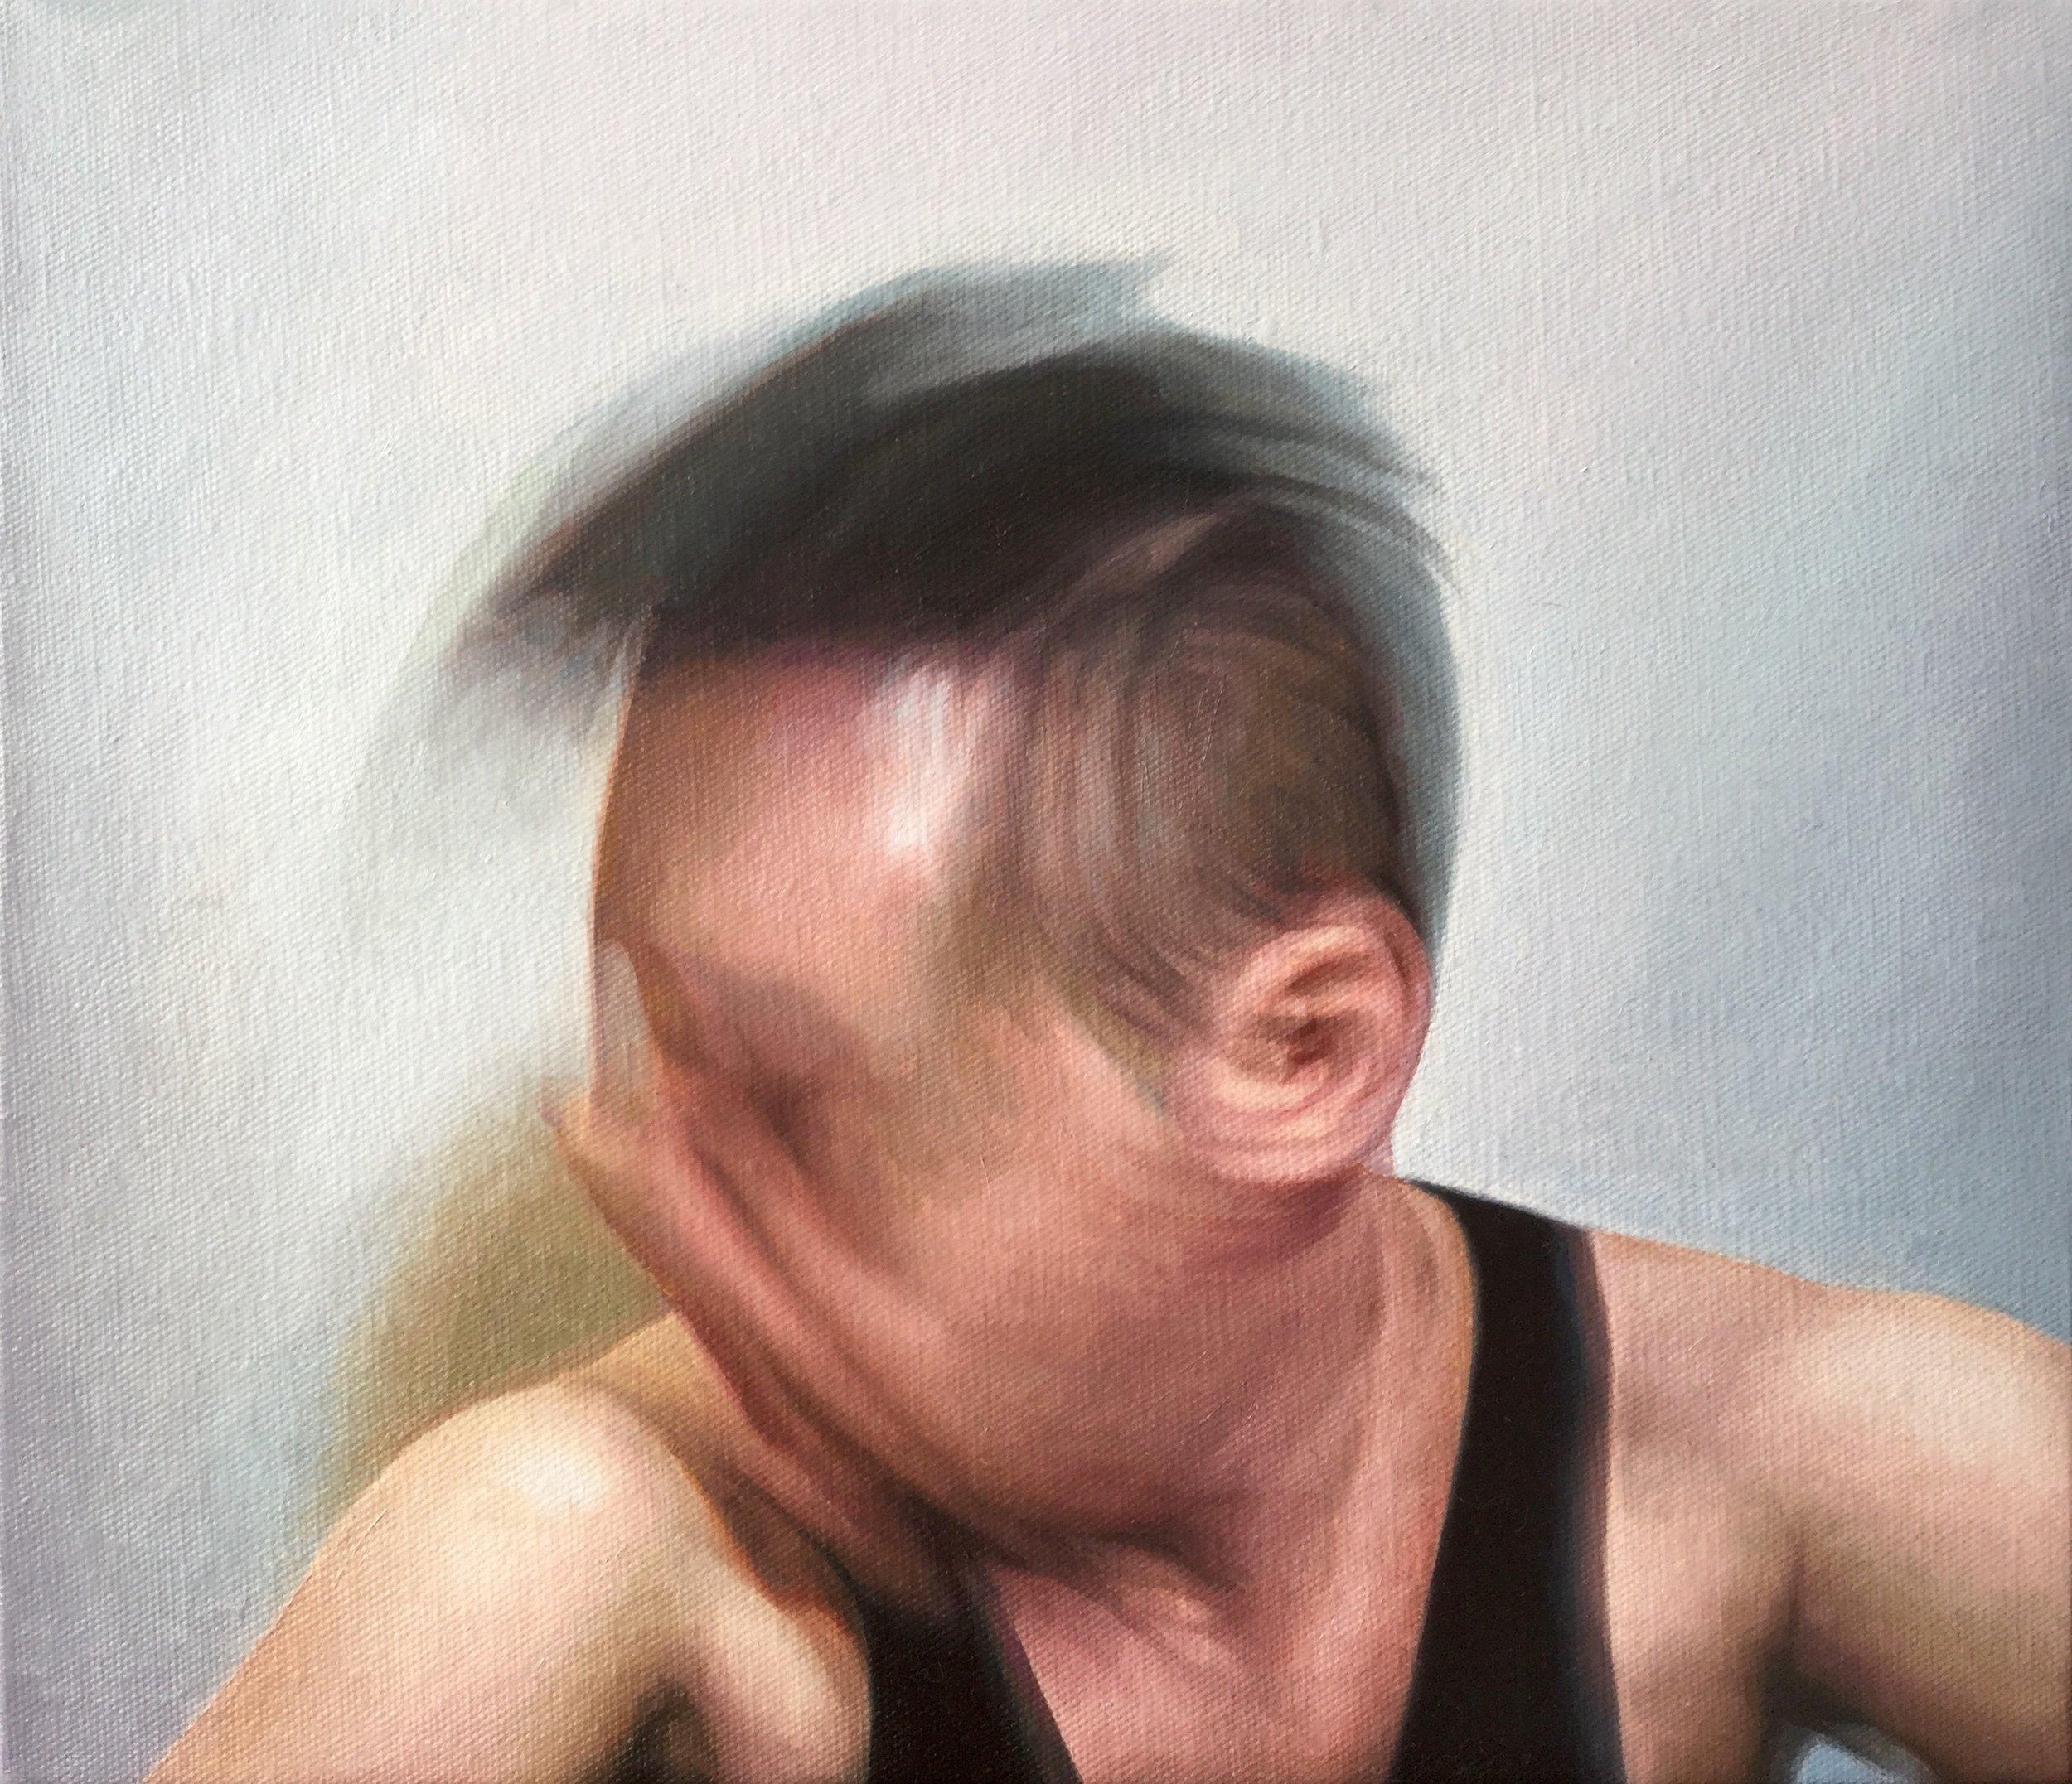 James Bonnici, Sam II oil on linen, 36 x 31 cm, available